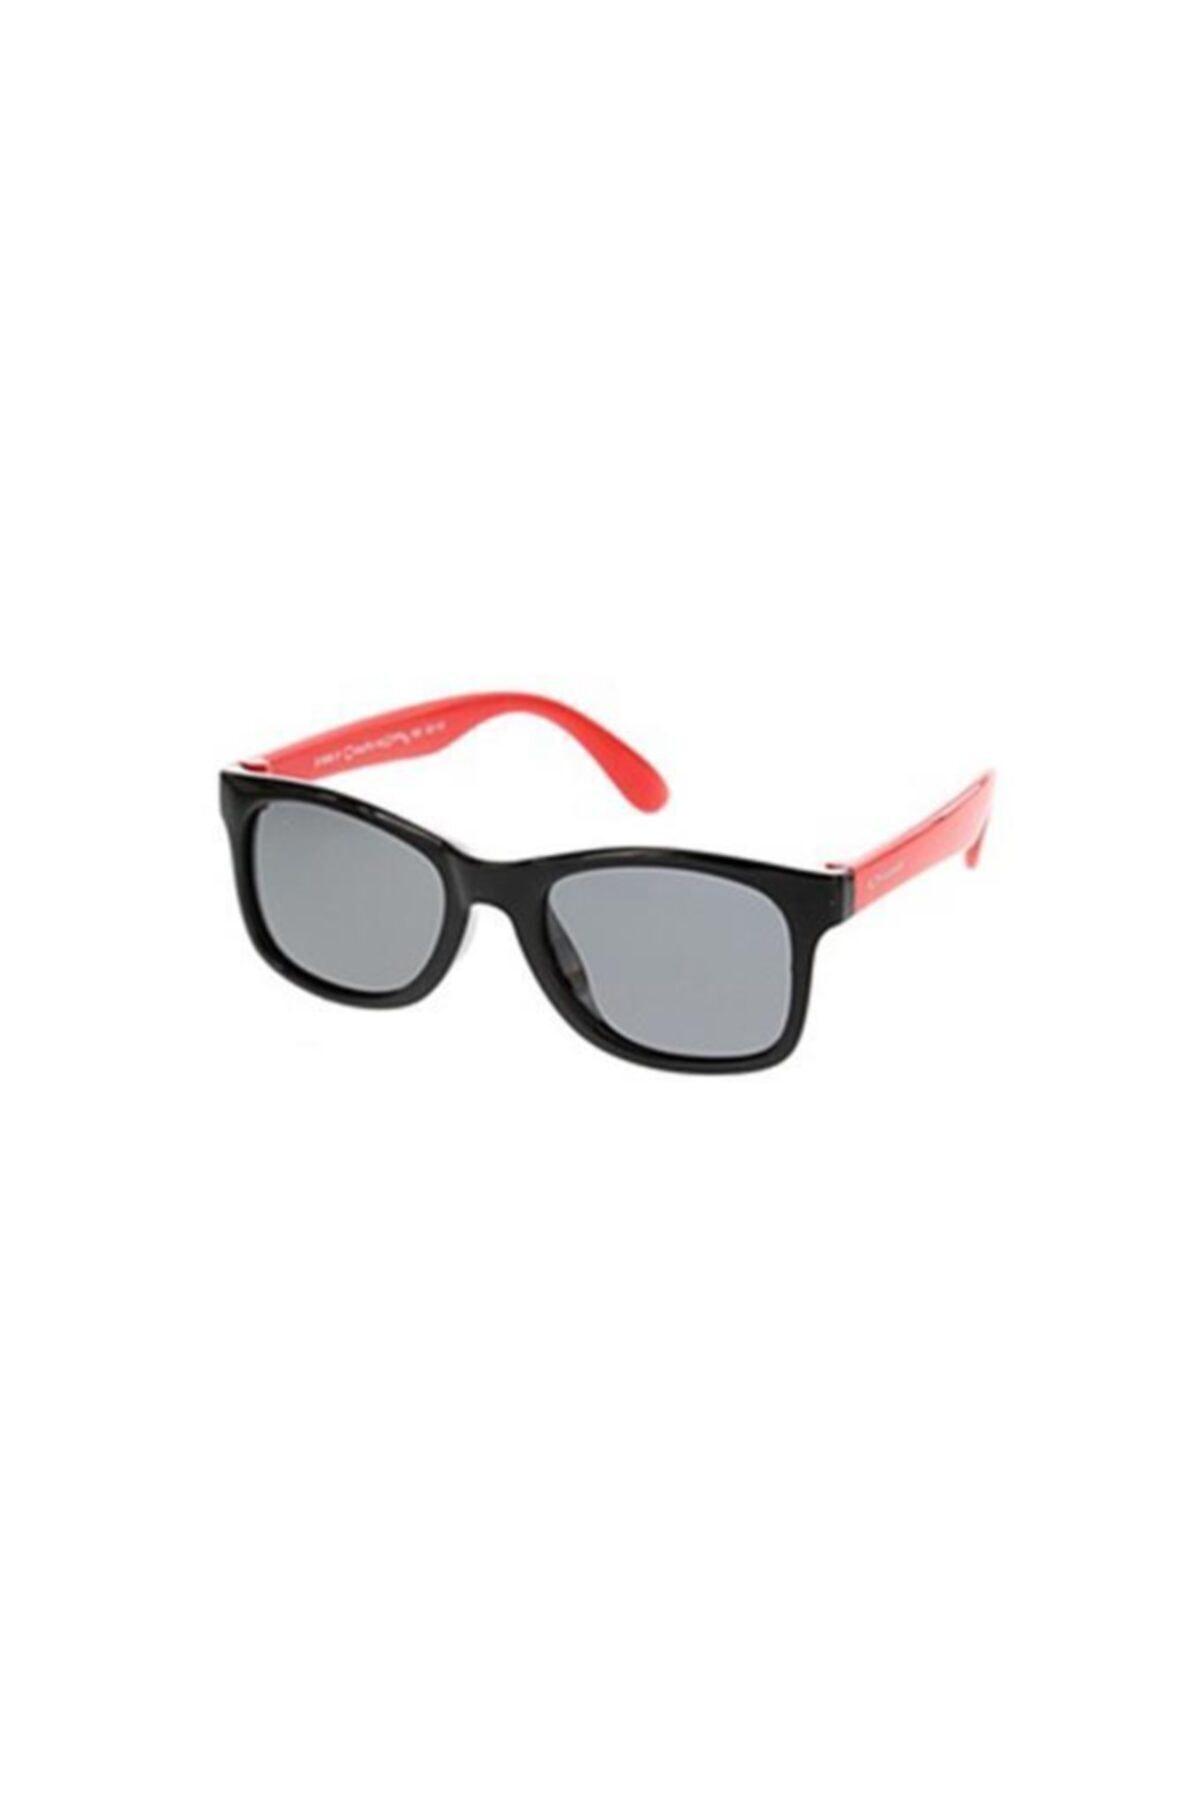 خرید مستقیم عینک آفتابی جدید برند Osse رنگ مشکی کد ty99118759